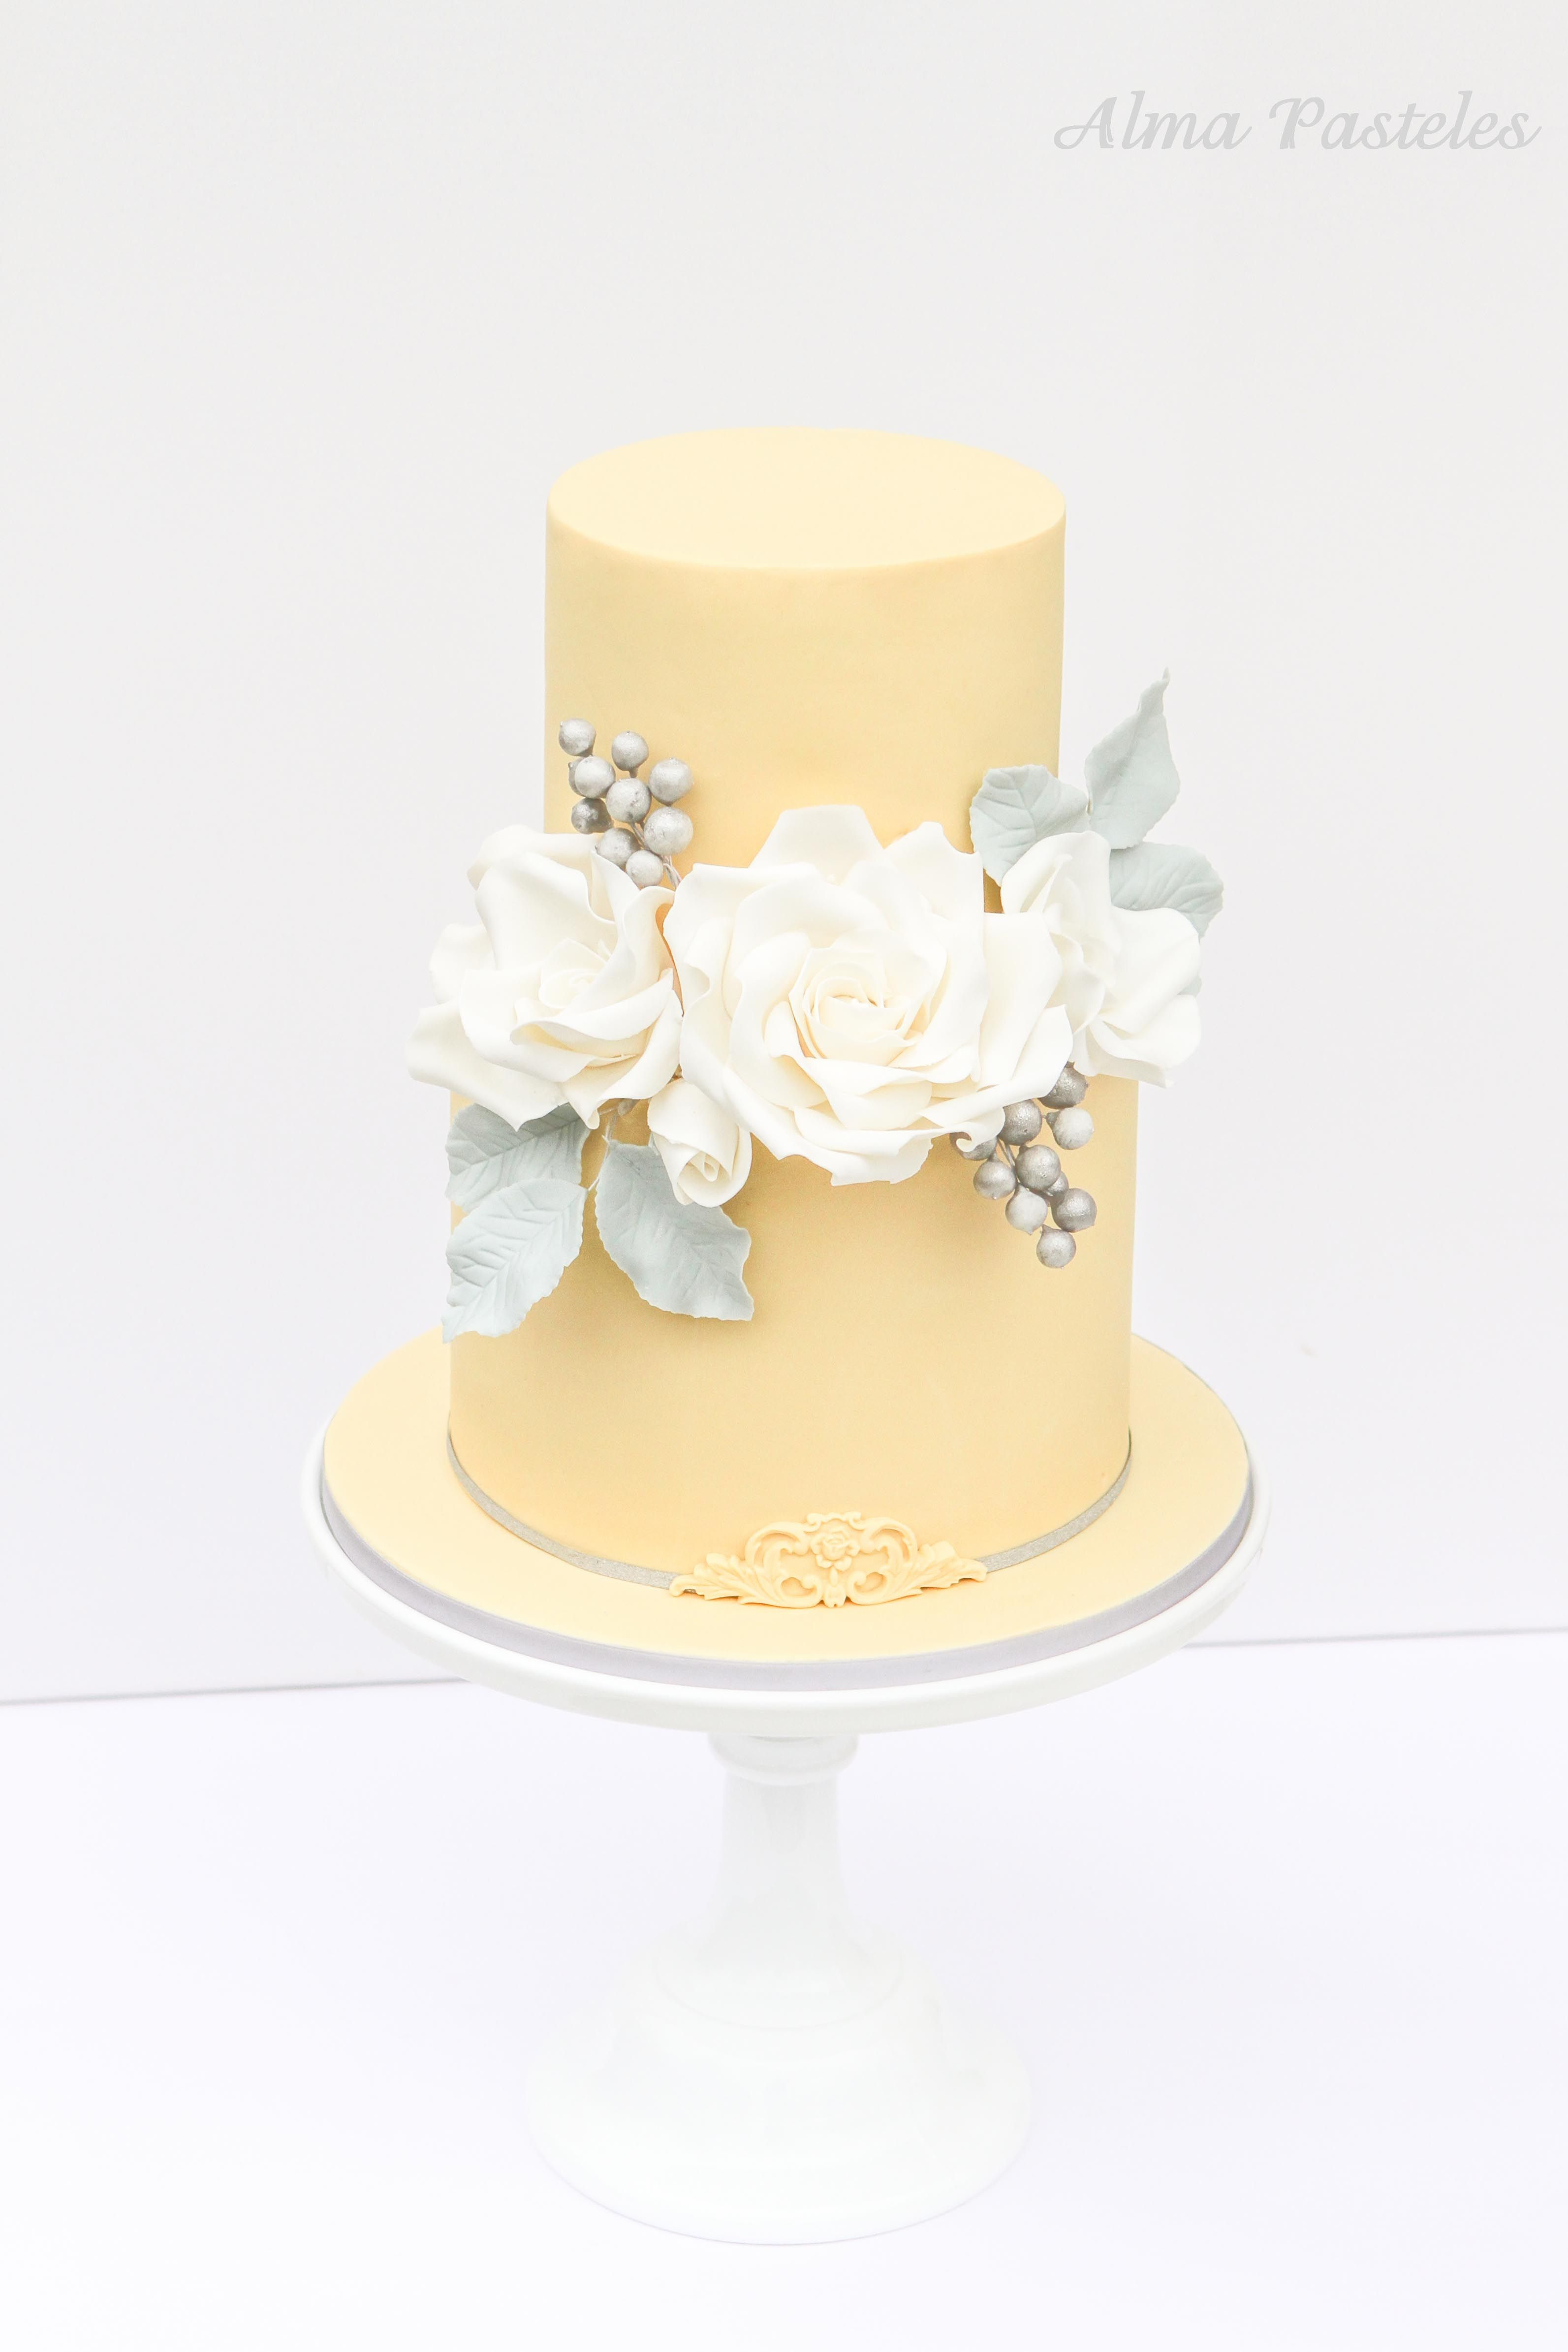 Round+Wedding+Cakes+-+Birthday+Cake+for+my+Dad\'s+80th+birthday ...